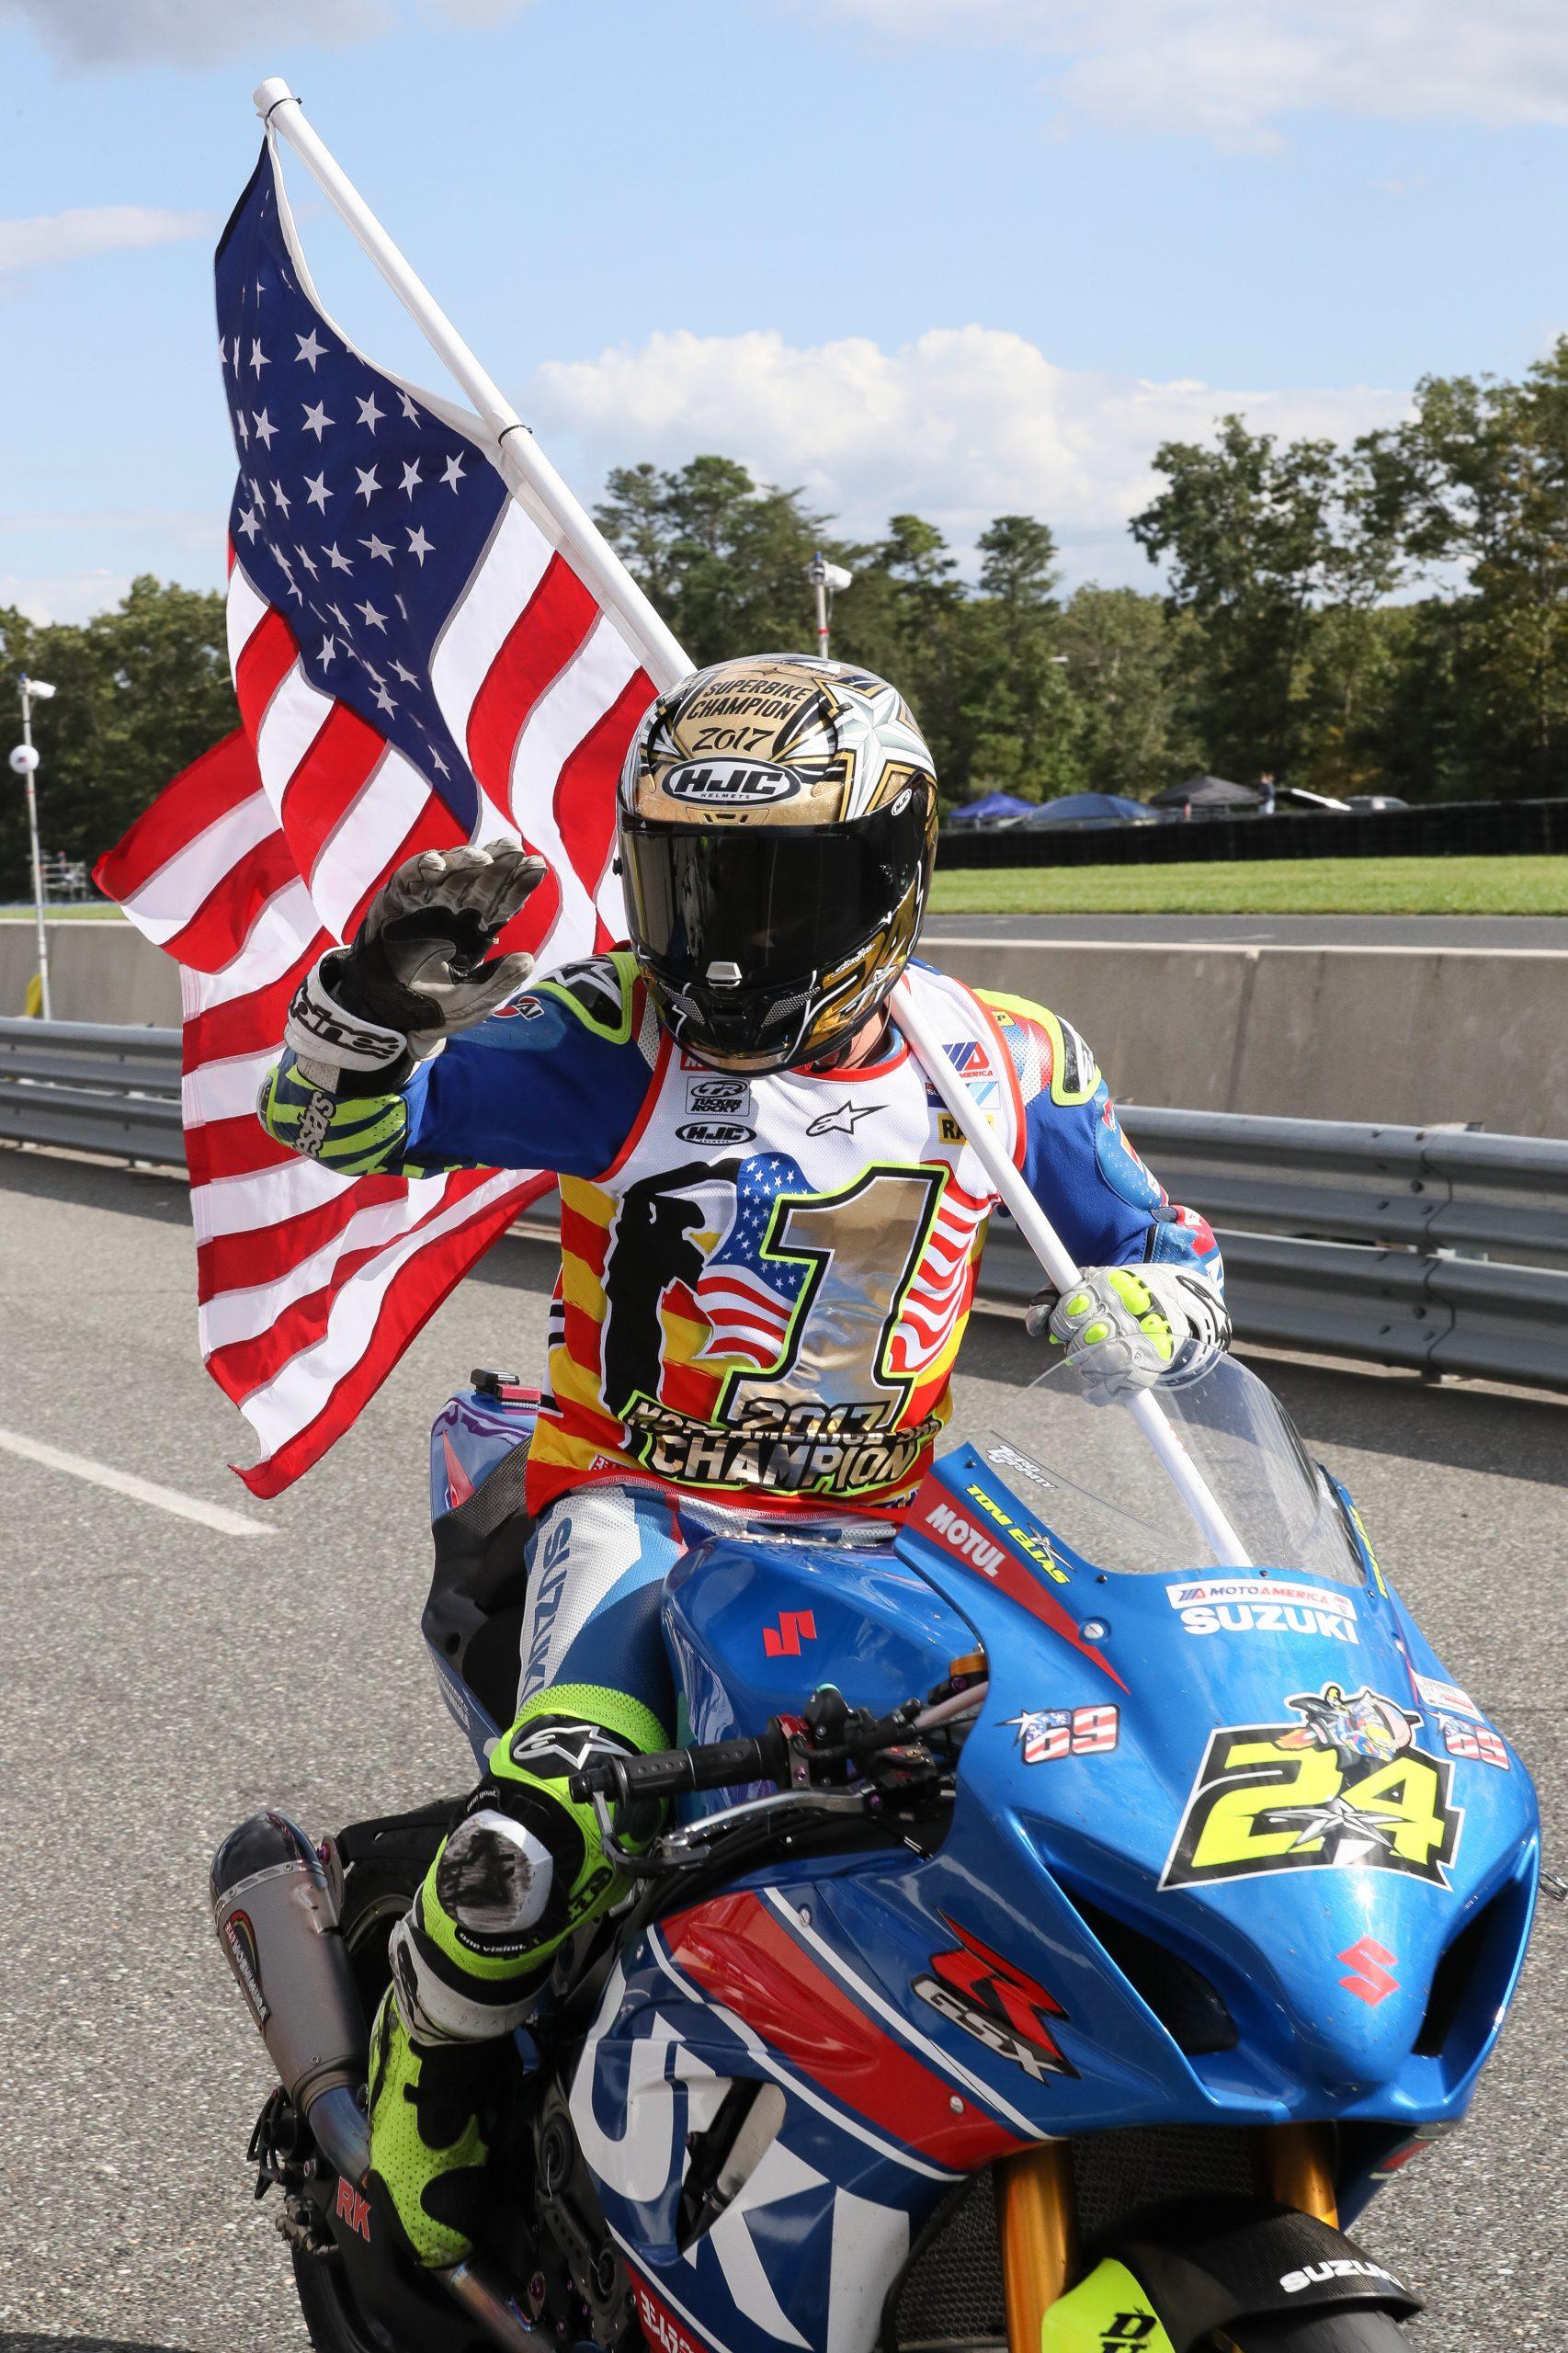 201024 The 2017 MotoAmerica Superbike Championship was a highlight of Toni's Suzuki racing career